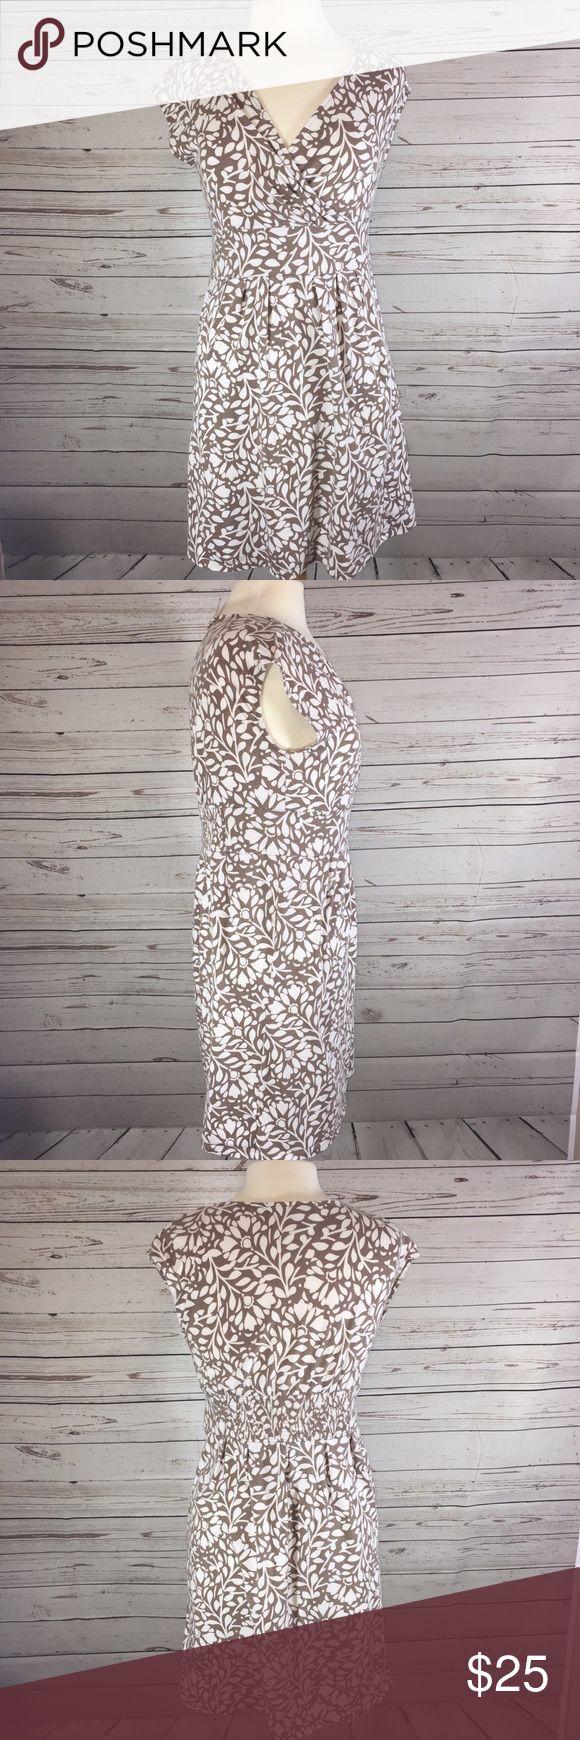 Women's loft dress small No flaws! Length 34 Armpit to Armpit 18 flat LOFT Dresses